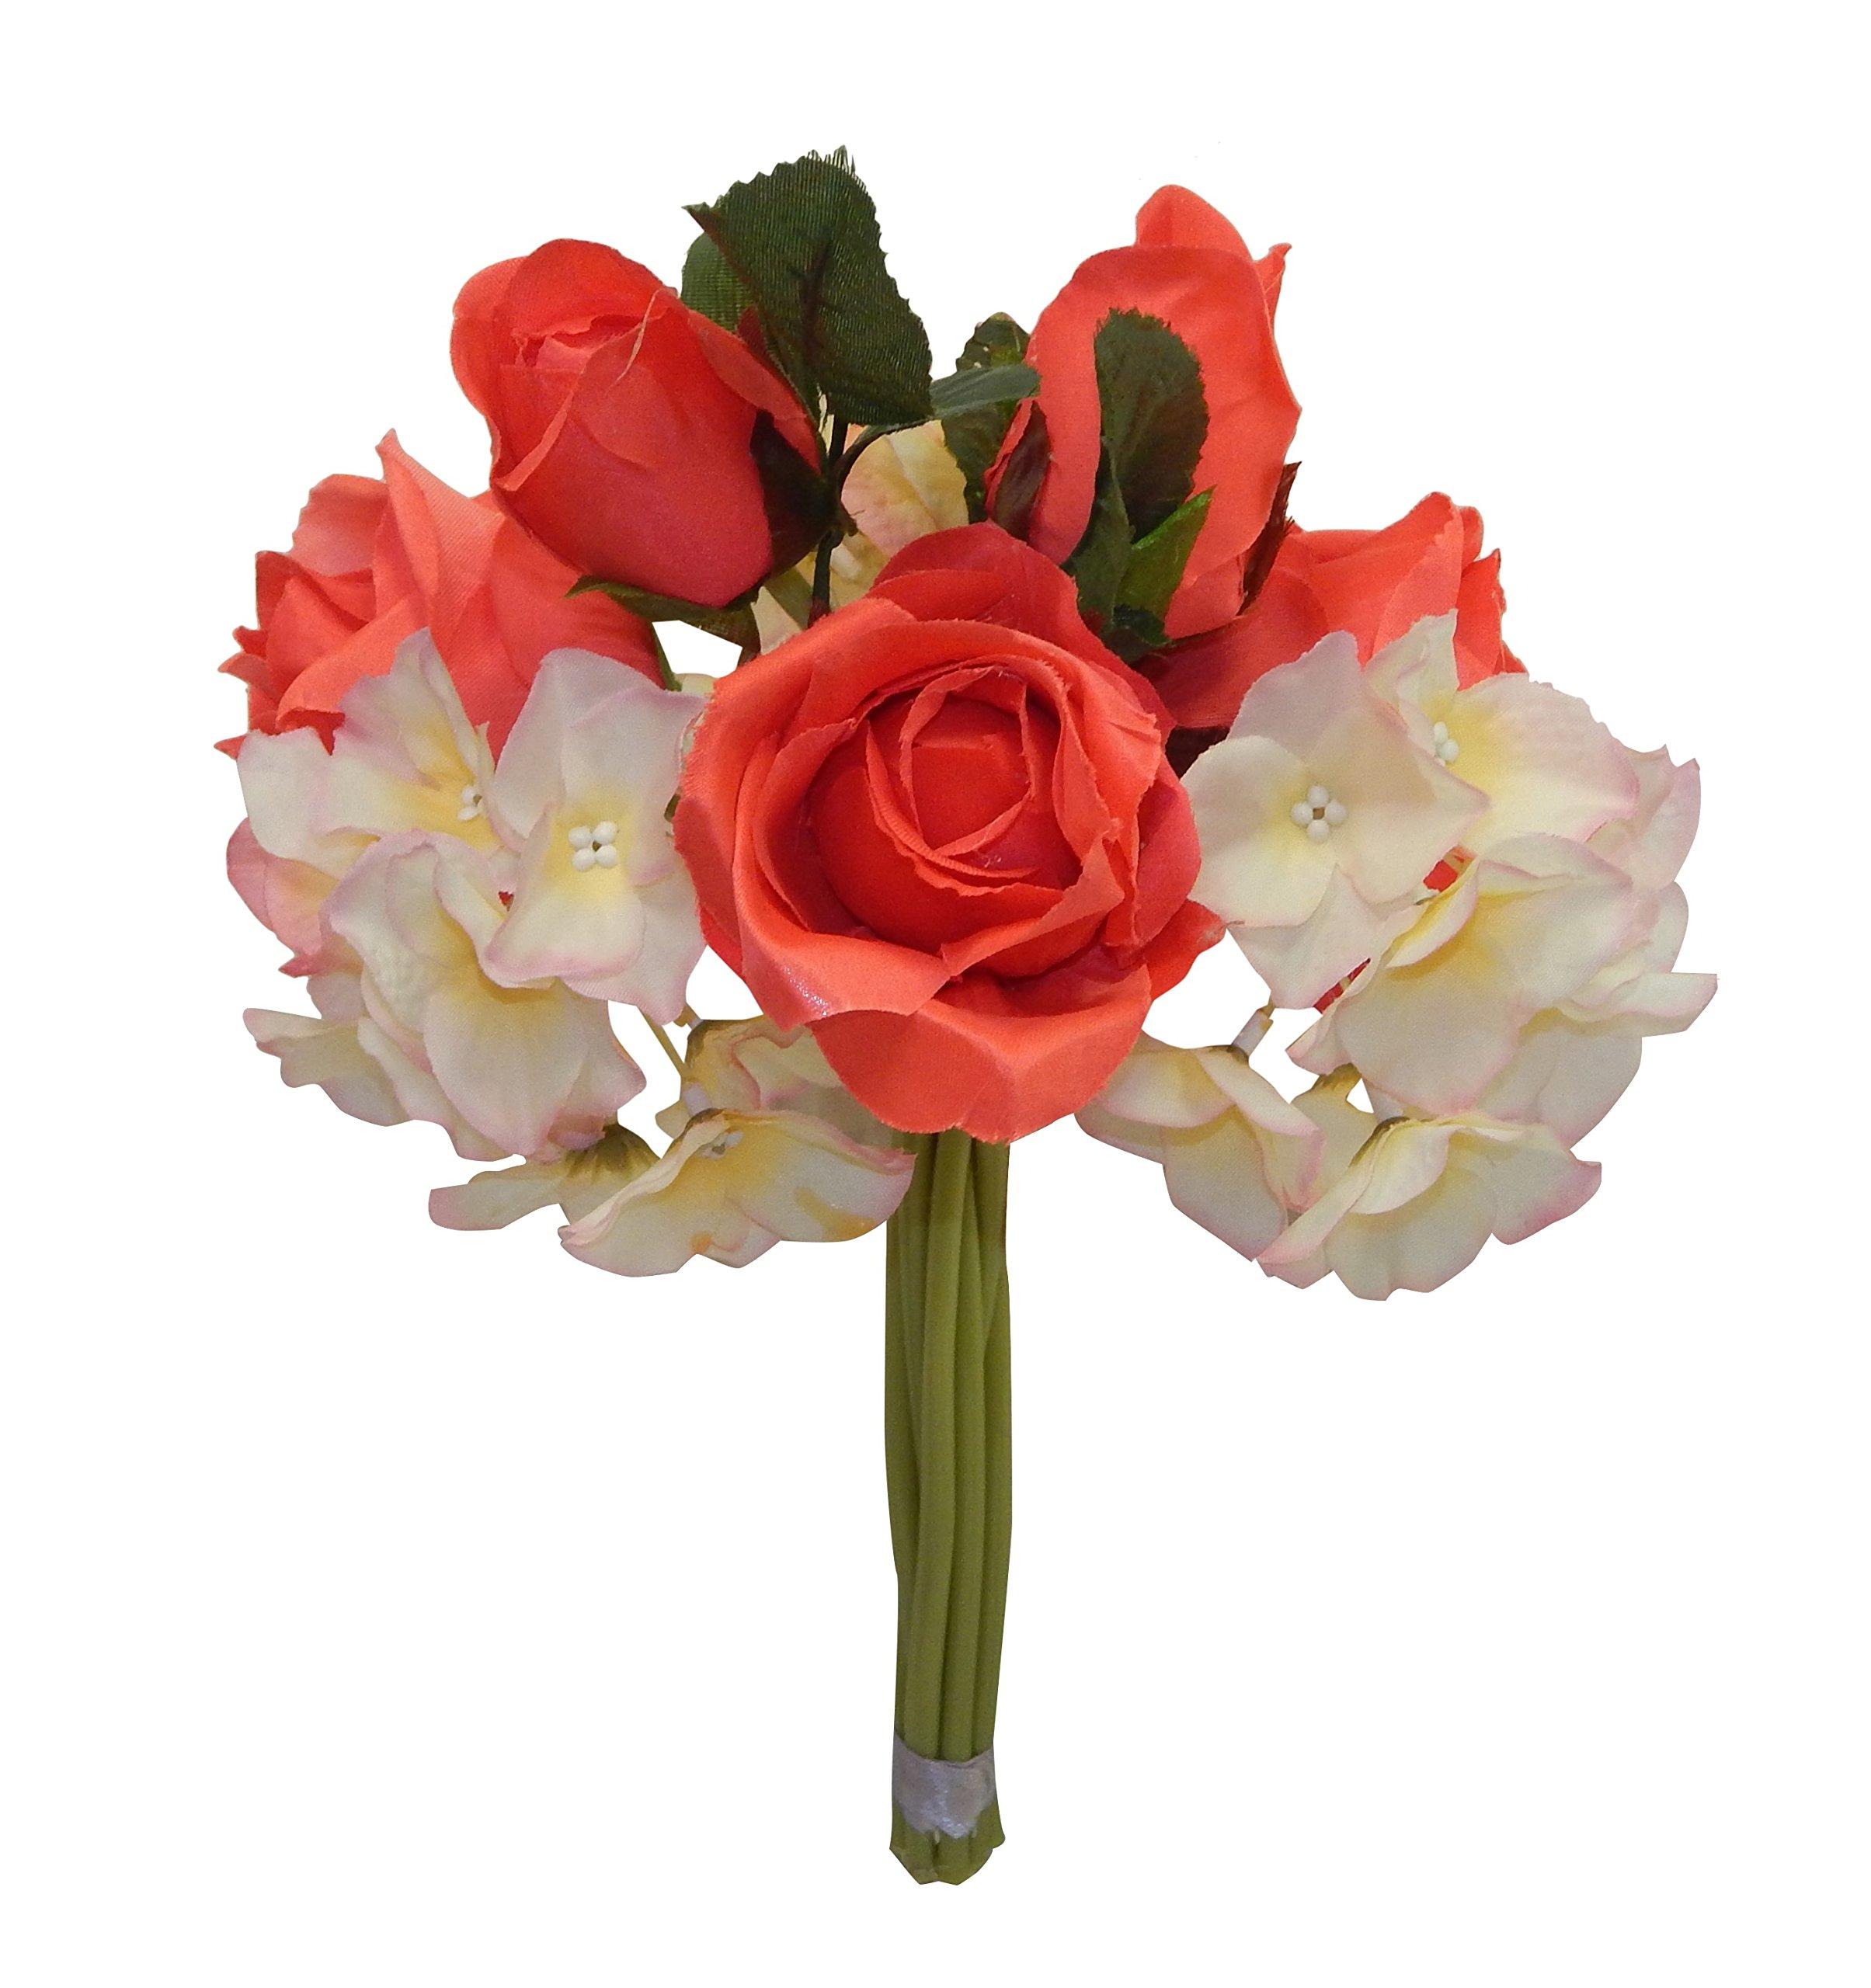 12-White-Satin-Rose-Bud-Hydrangea-Bouquet-Artificial-Silk-Flowers-Centerpieces-Home-Decor